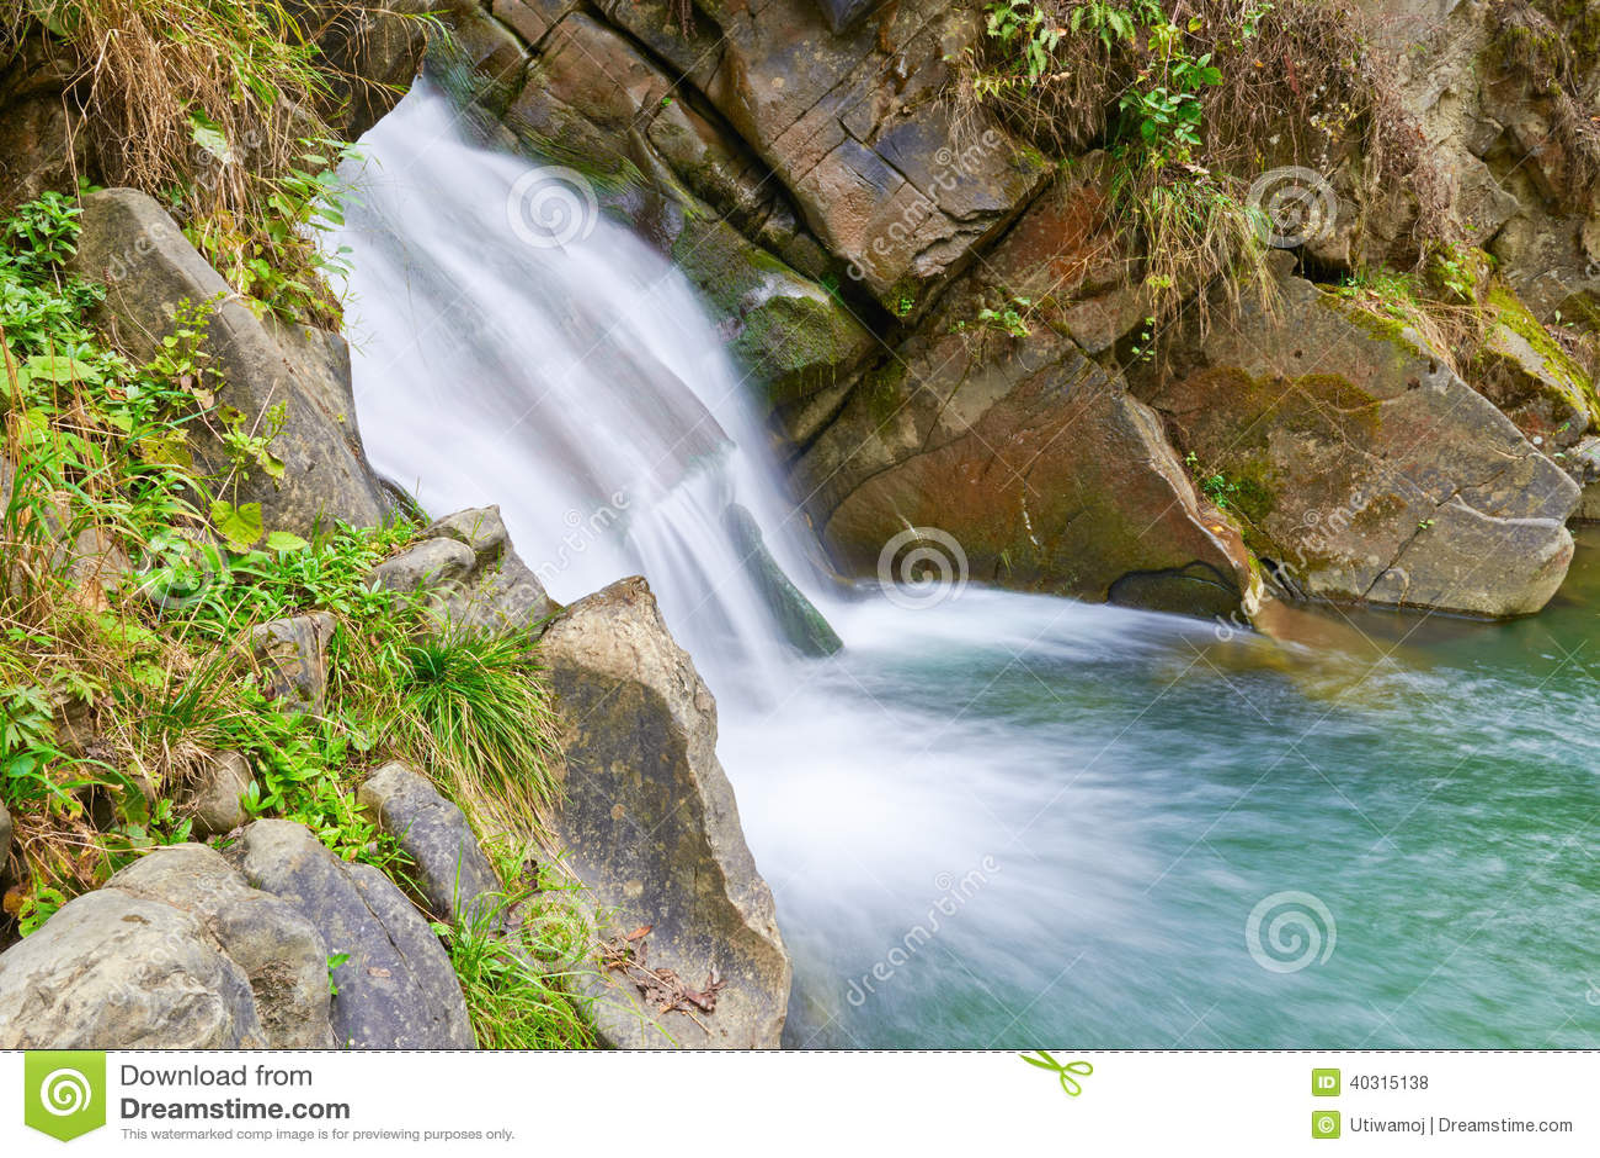 La cascada de zaskalnik fuente natural de agua foto de - Fuentes de cascada ...